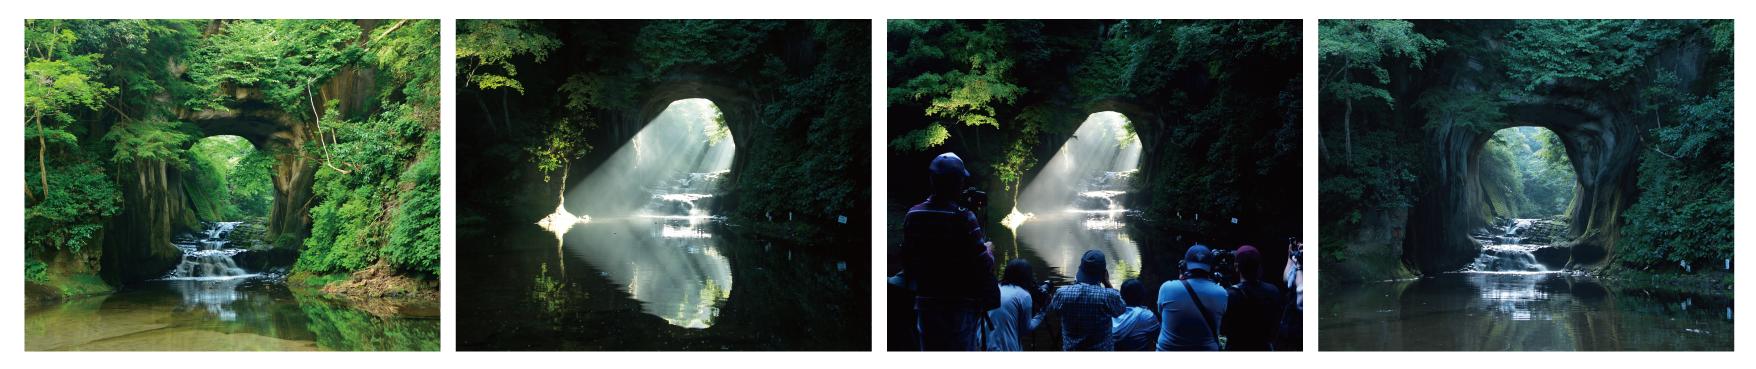 広場 清水 渓流 濃溝の滝